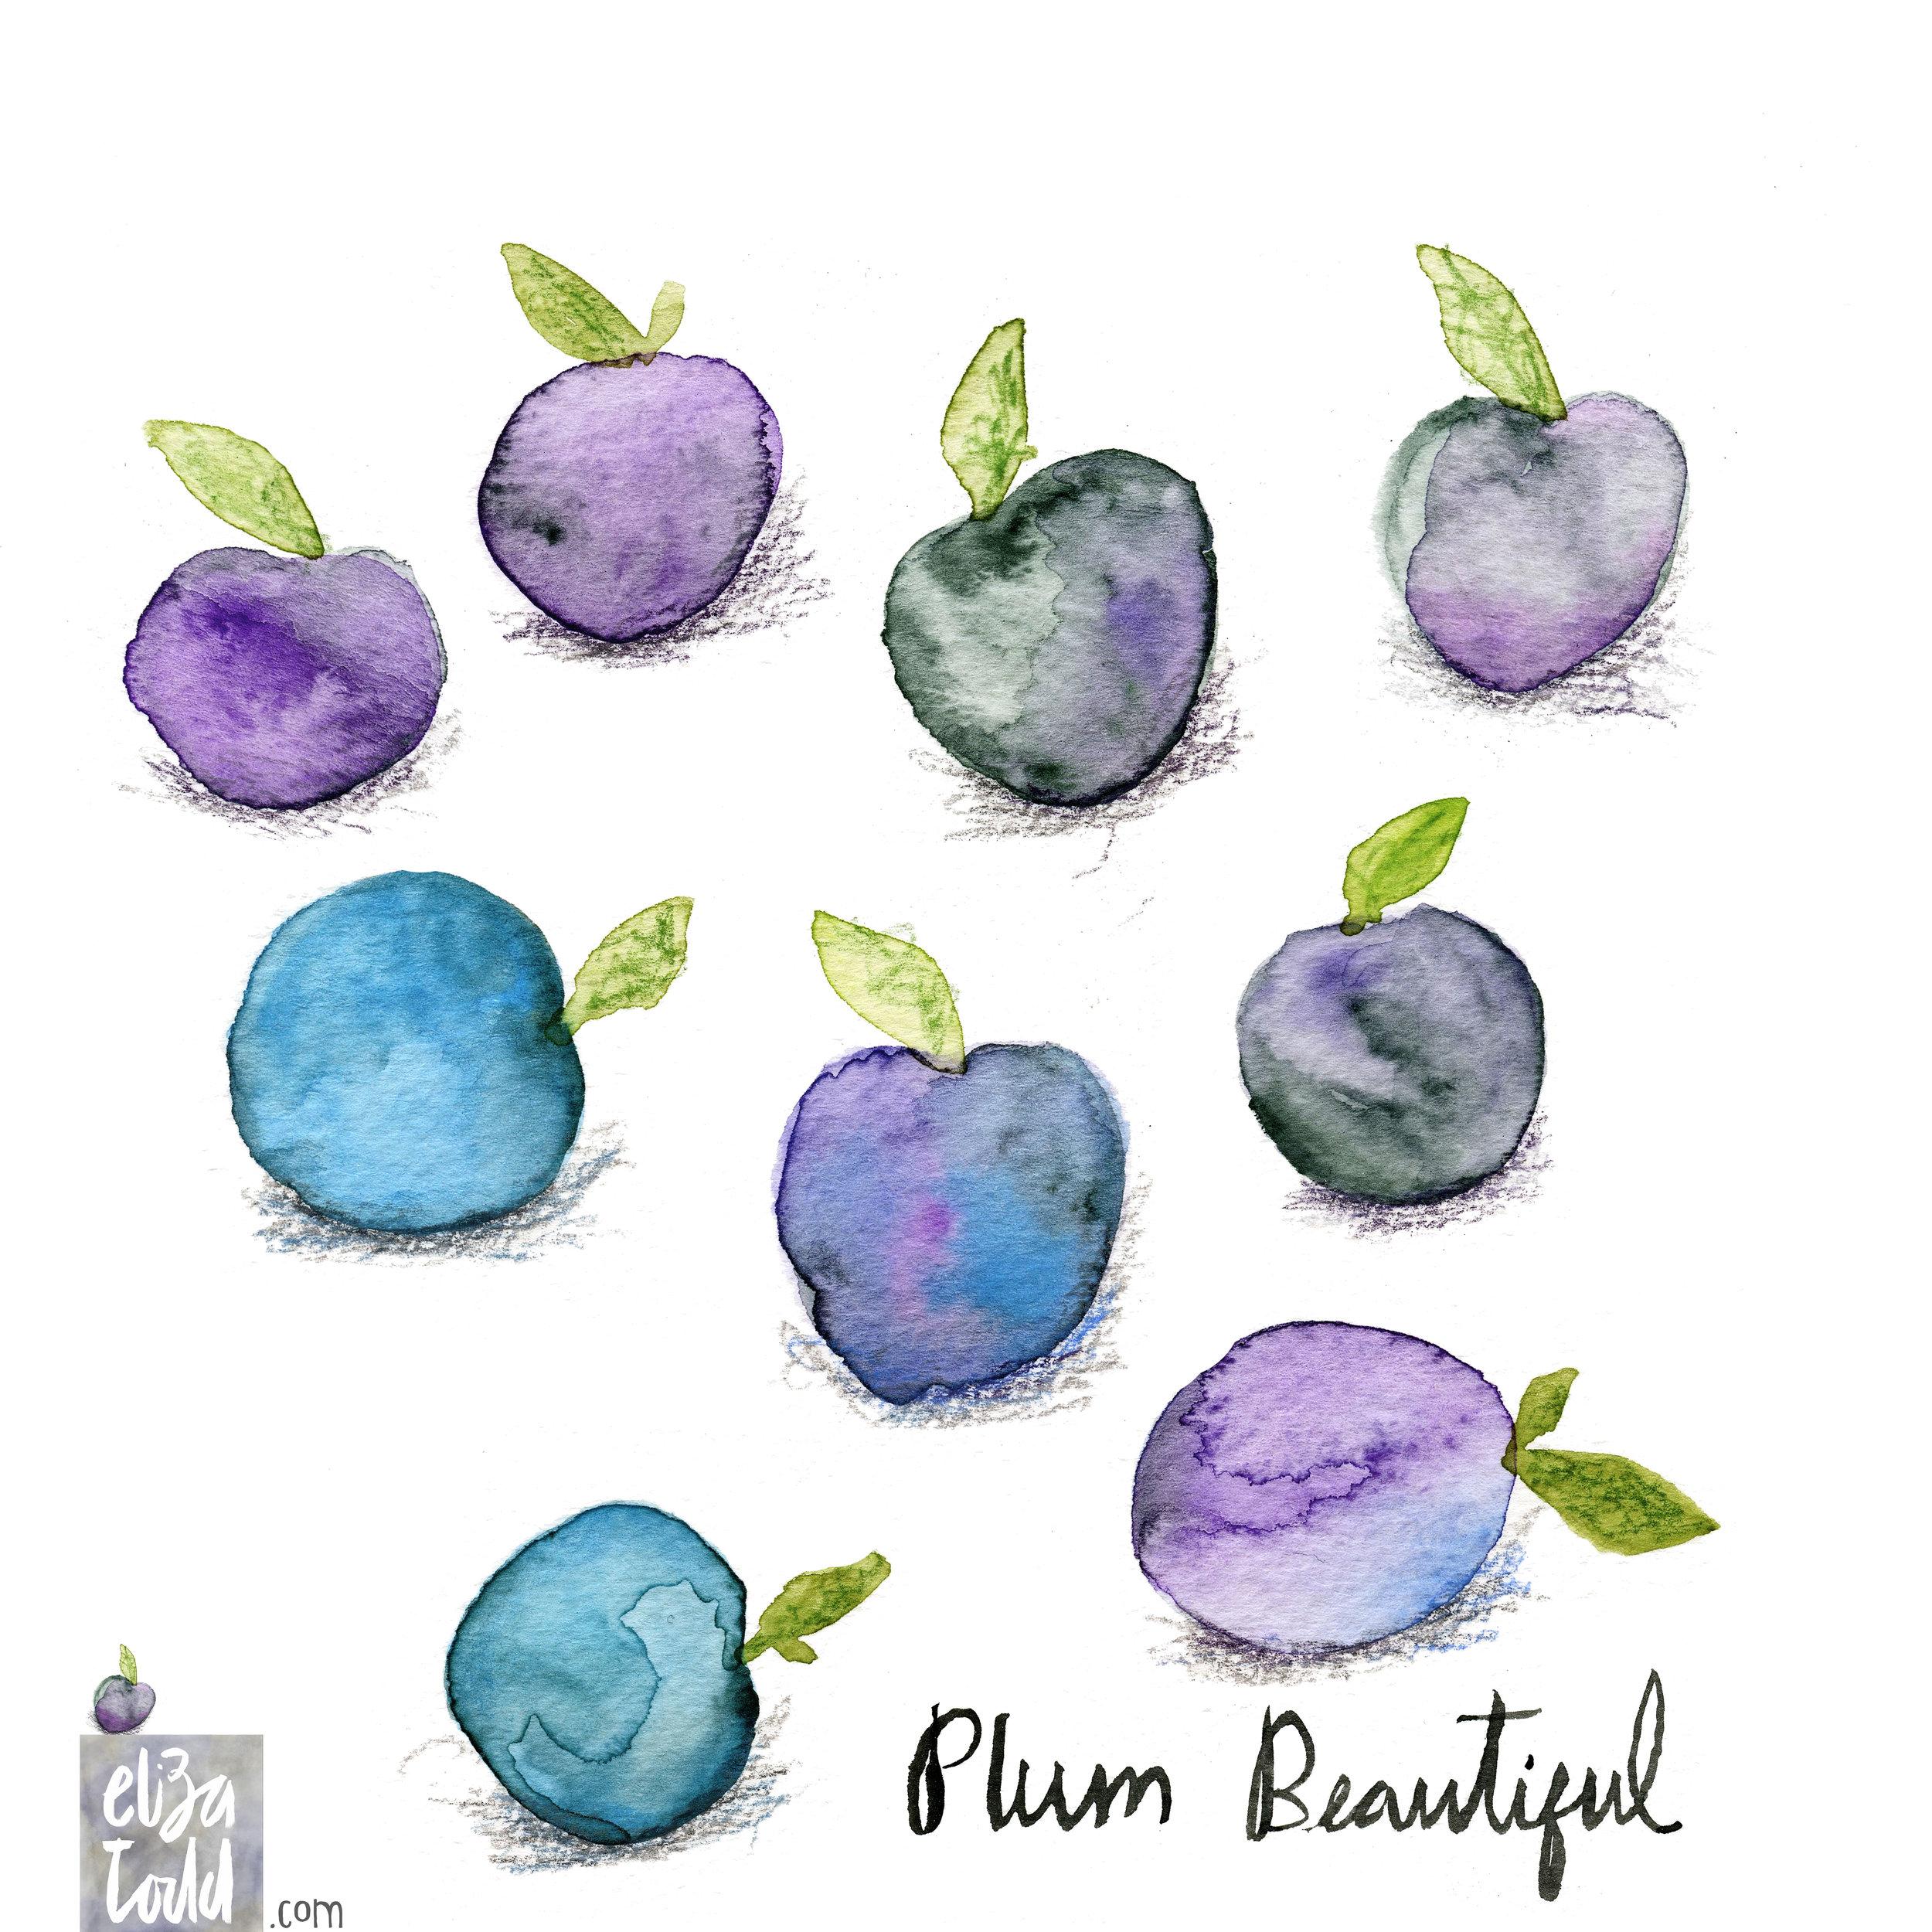 plum-beautiful.jpg